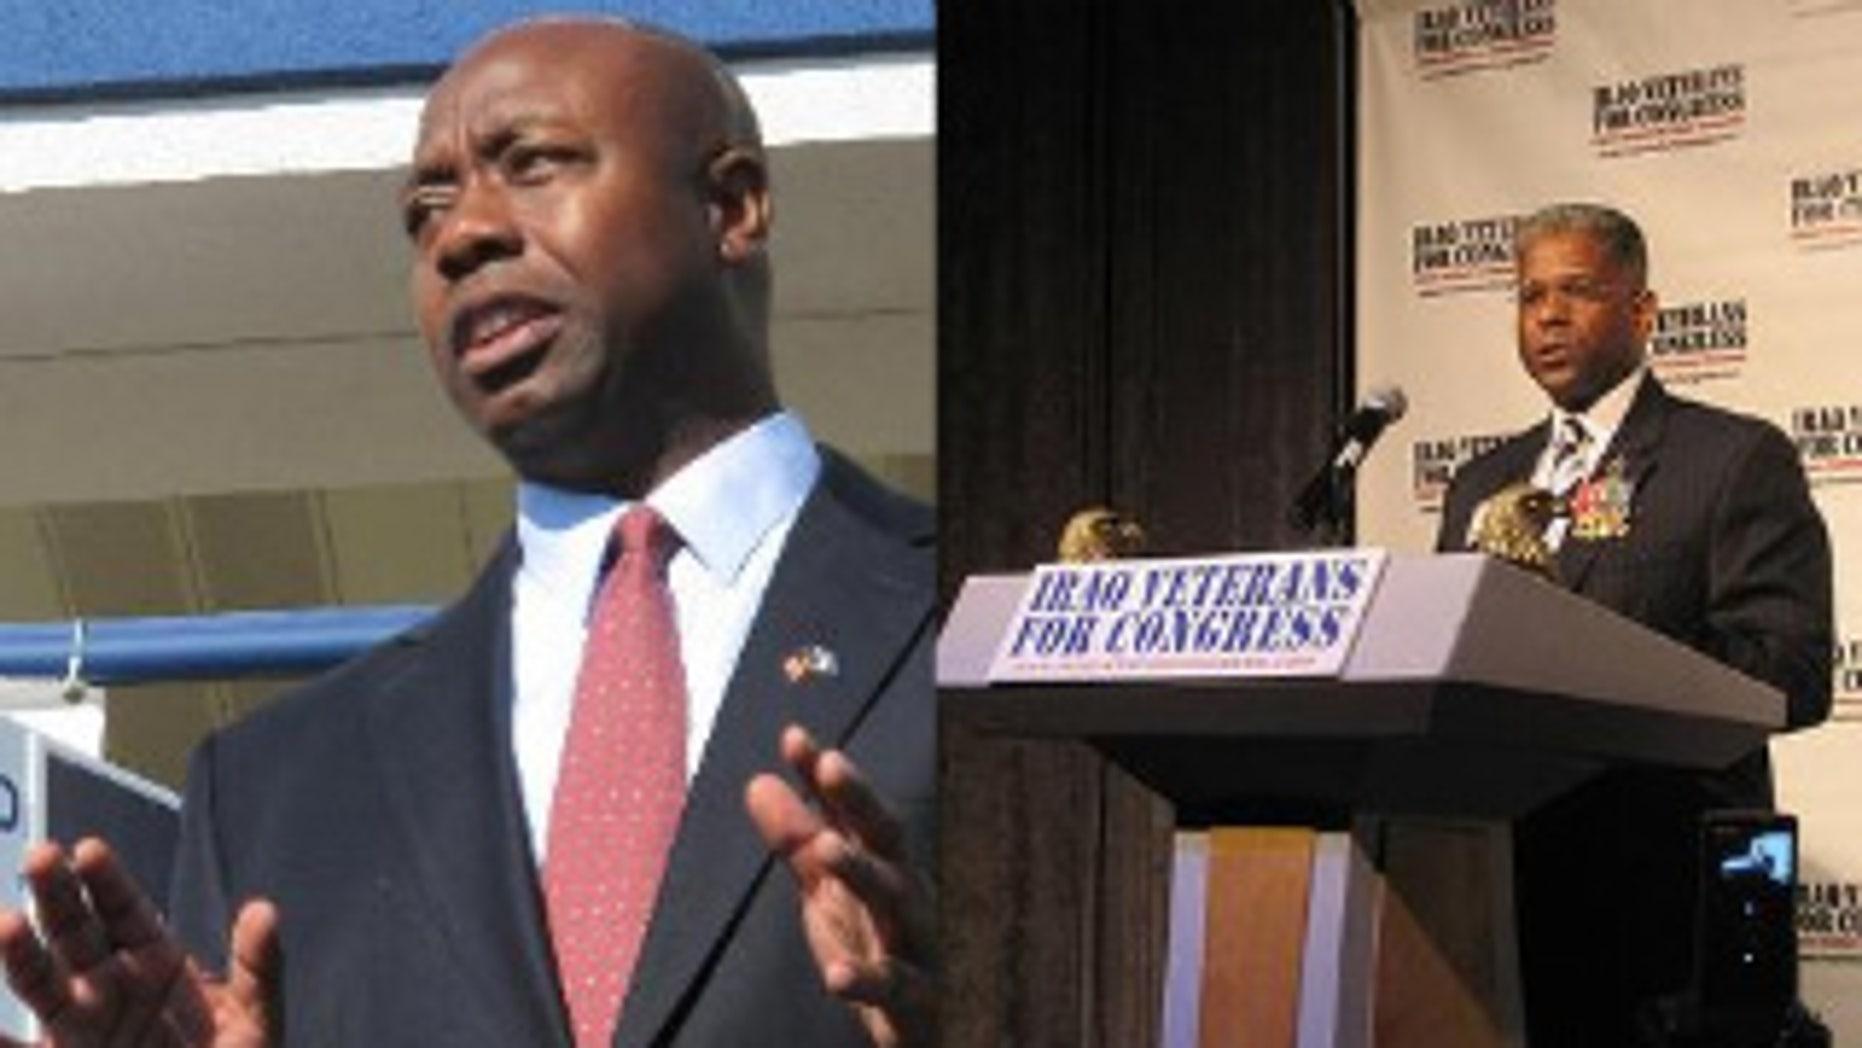 Congressmen-elect Tim Scott of South Carolina (left) and Allen West of Florida. (AP Photo/Bruce Smith, Allen West Campaign)